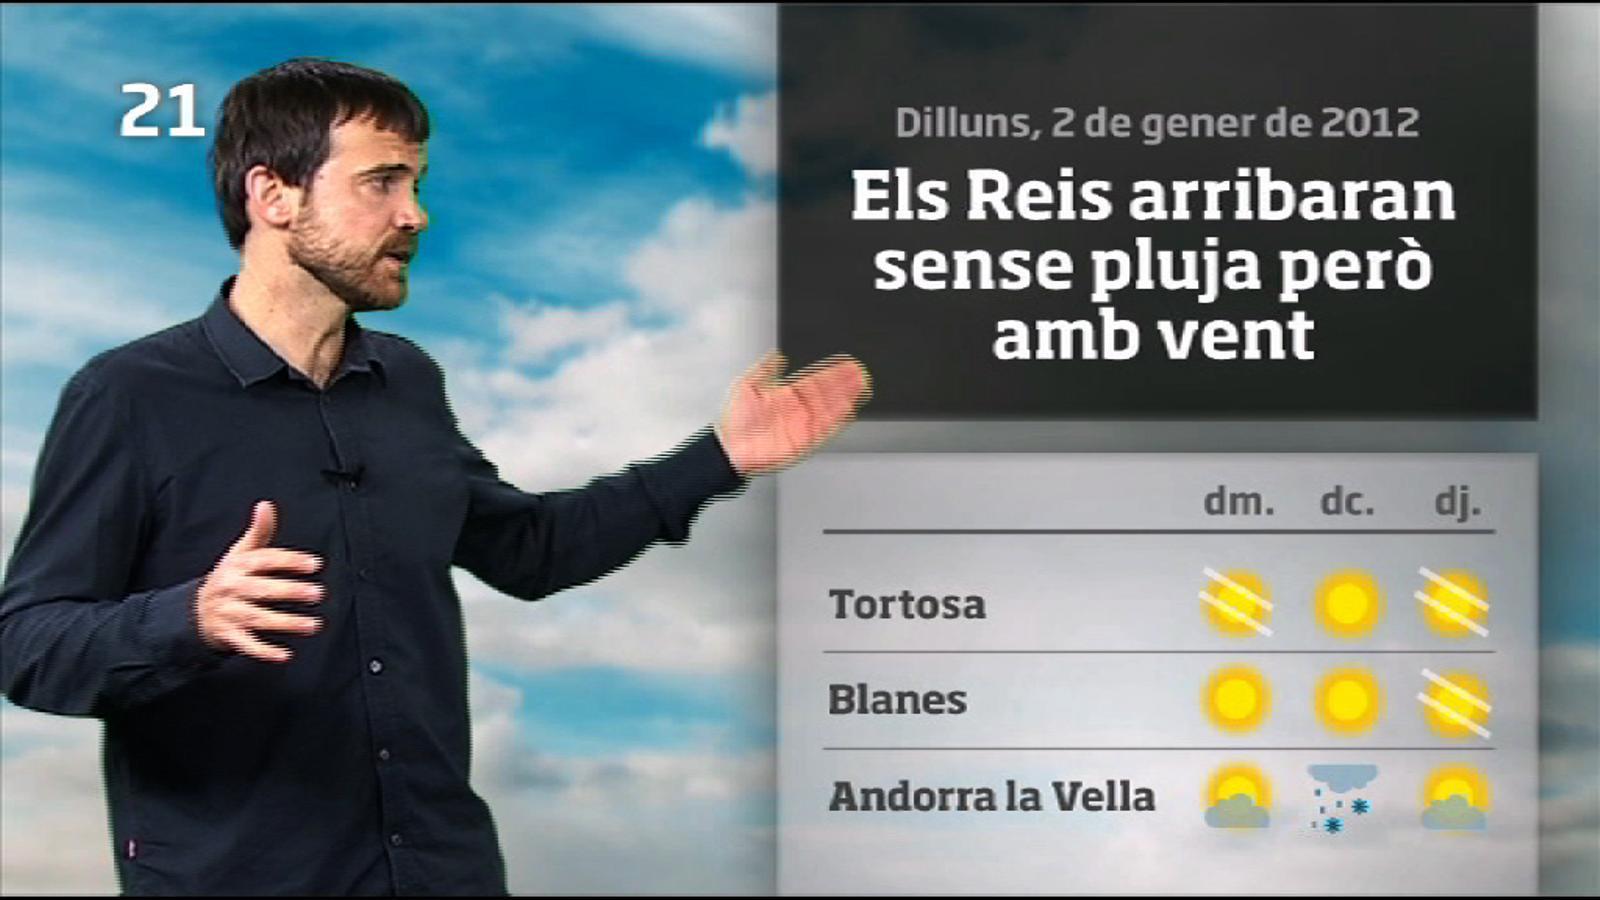 La méteo en 1 minut: setmana poc d'hivern i sense pluja (03/01/2012)